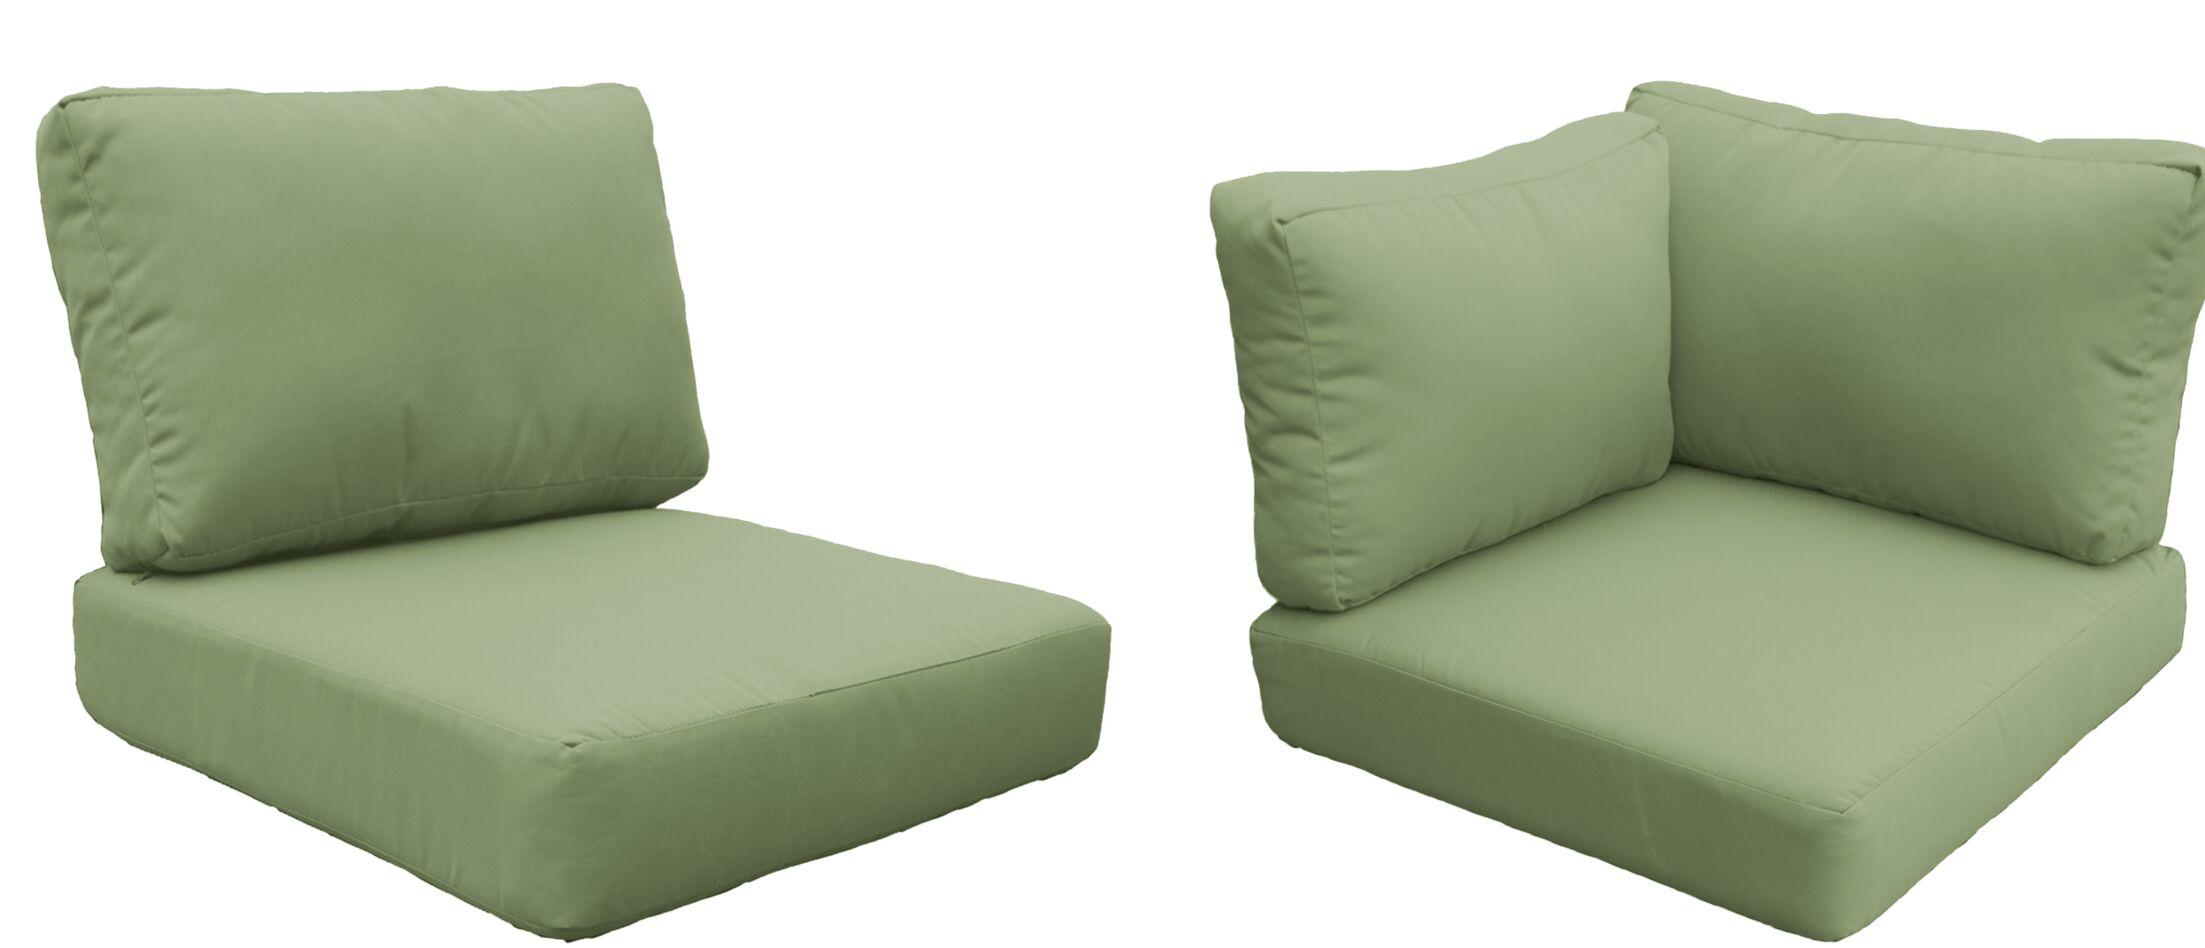 Capecod 17 Piece Outdoor Cushion Set Fabric: Cilantro